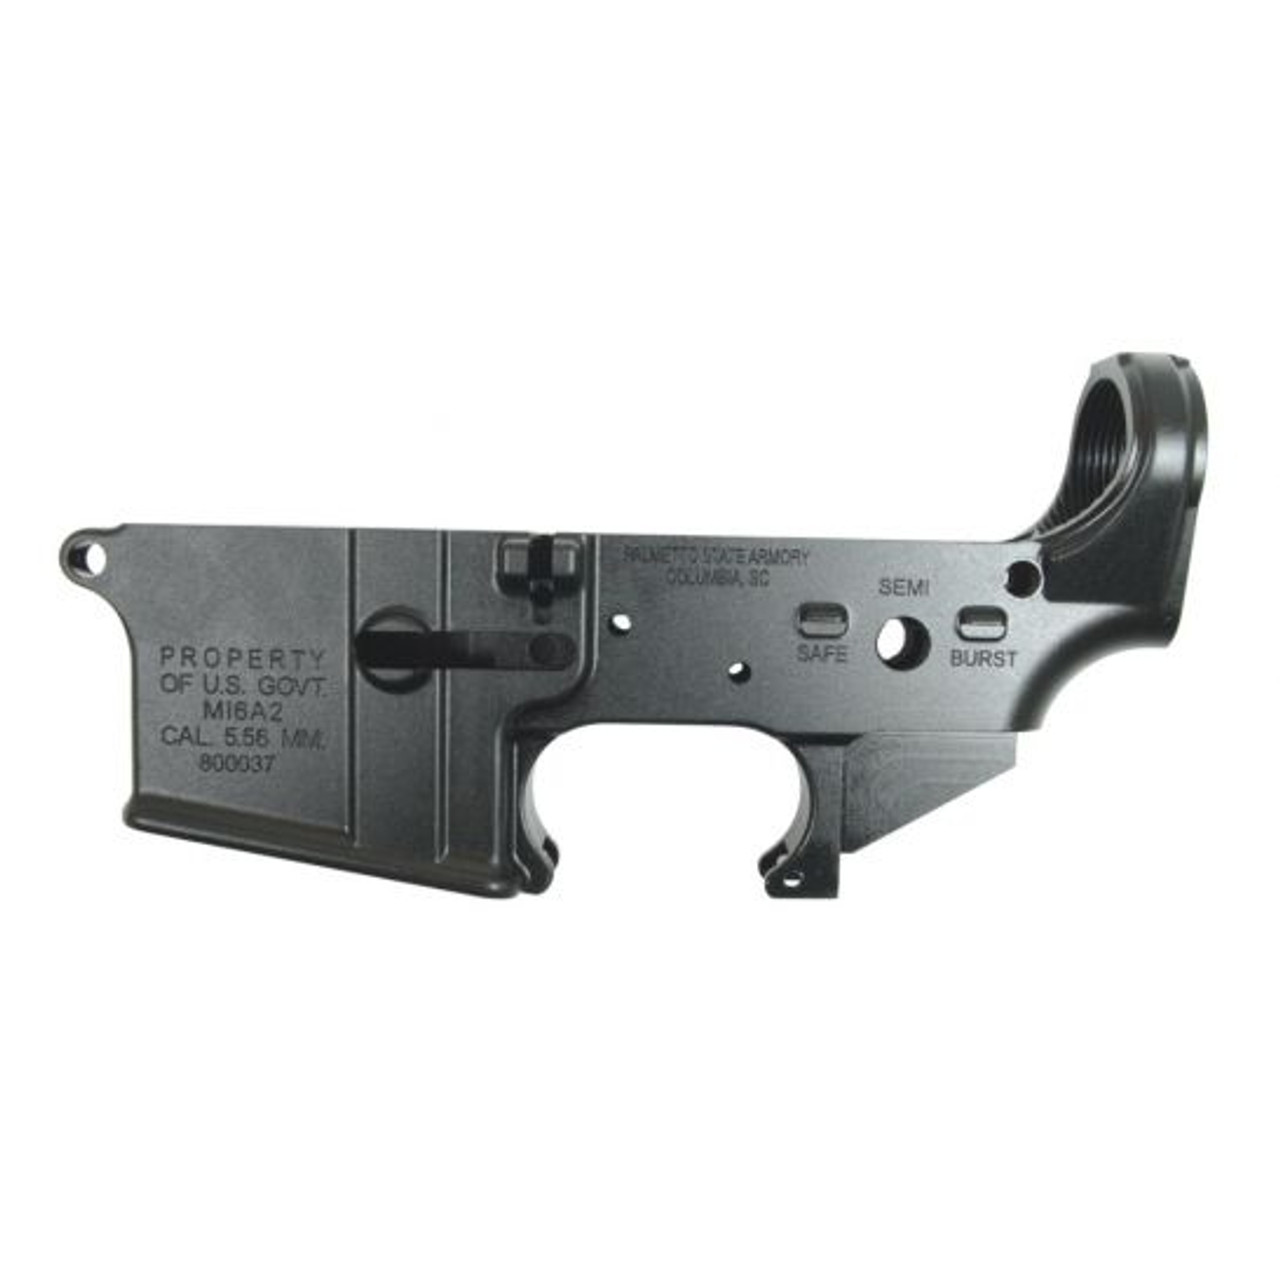 PSA M16A2 Lower Receiver CALIFORNIA LEGAL - .223/5.56